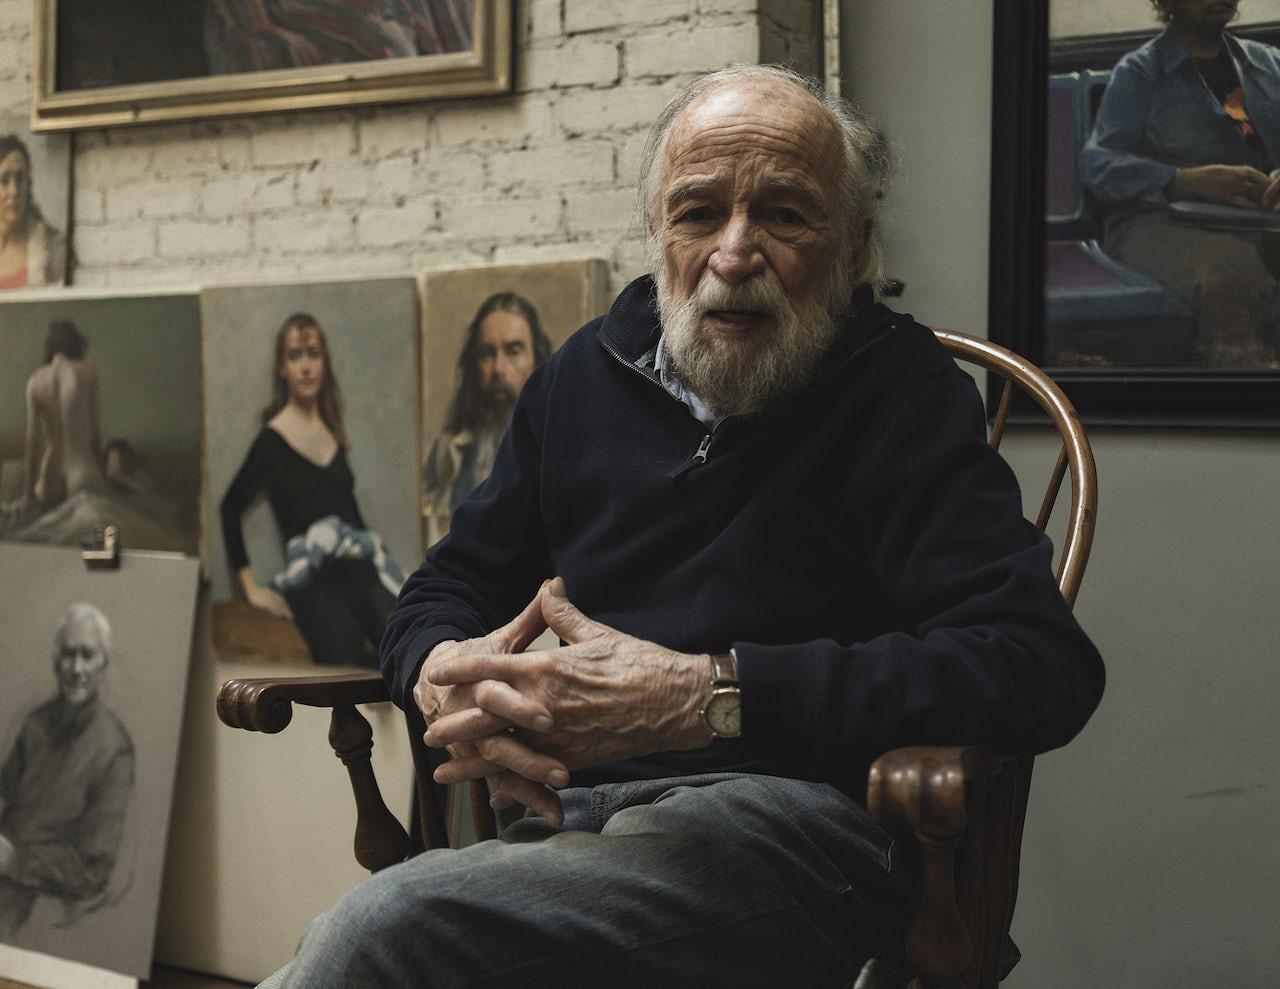 Burton Silverman, photographed in his studio in 2018.